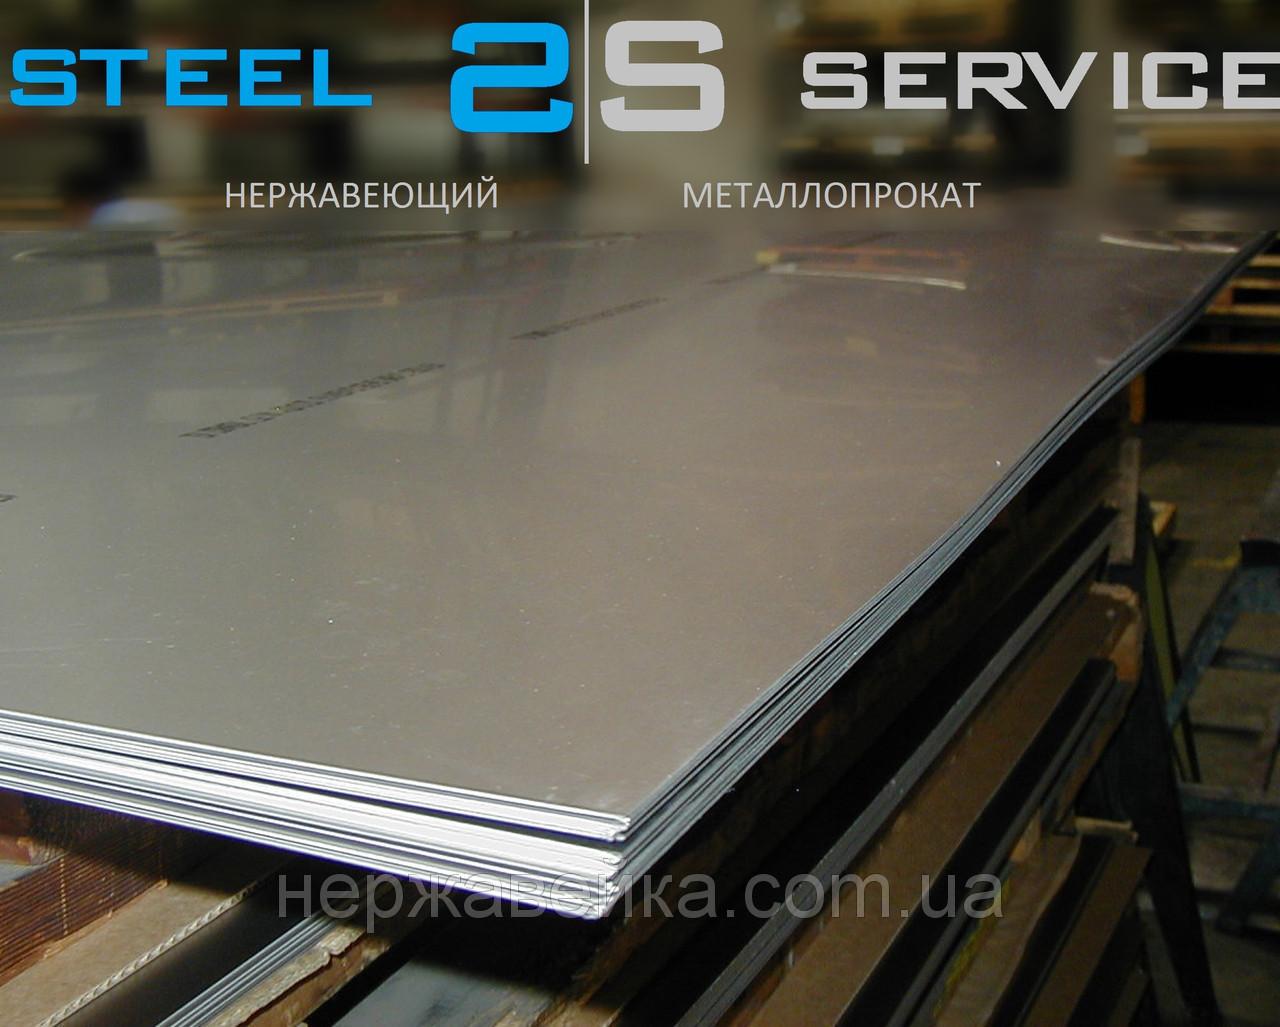 Нержавейка лист 4х1500х3000мм  AISI 316L(03Х17Н14М3) 2B - матовый,  кислотостойкий